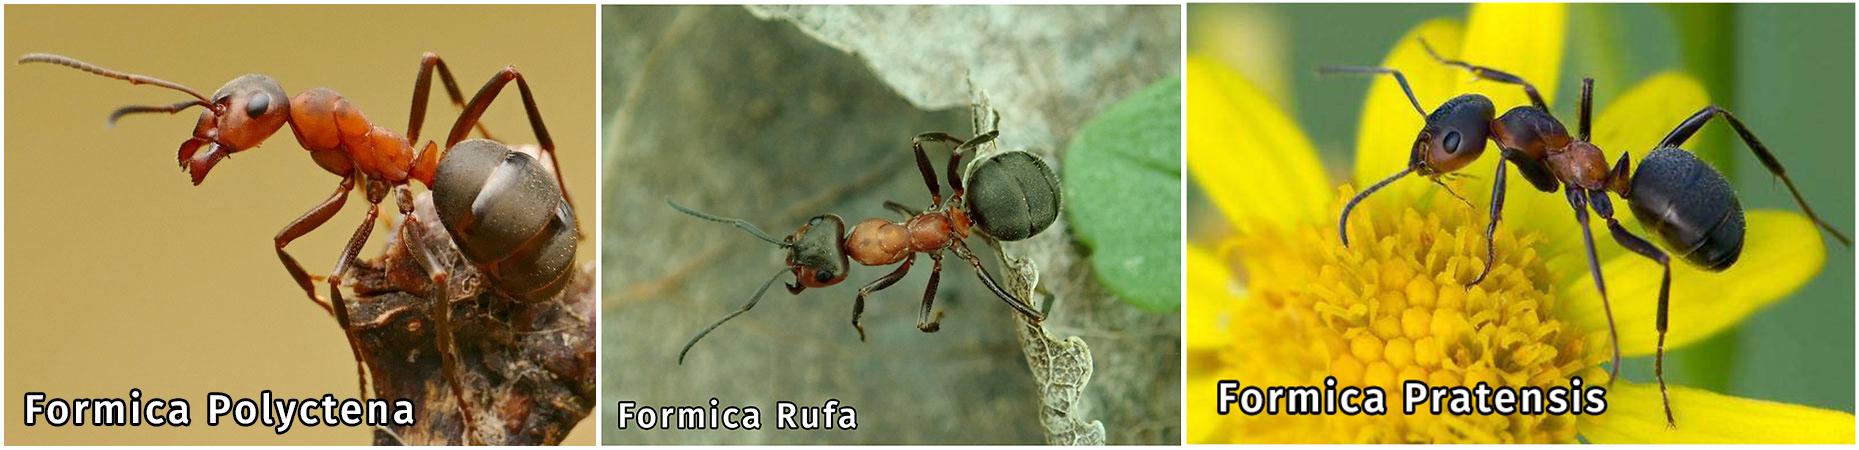 Муравьи Formica